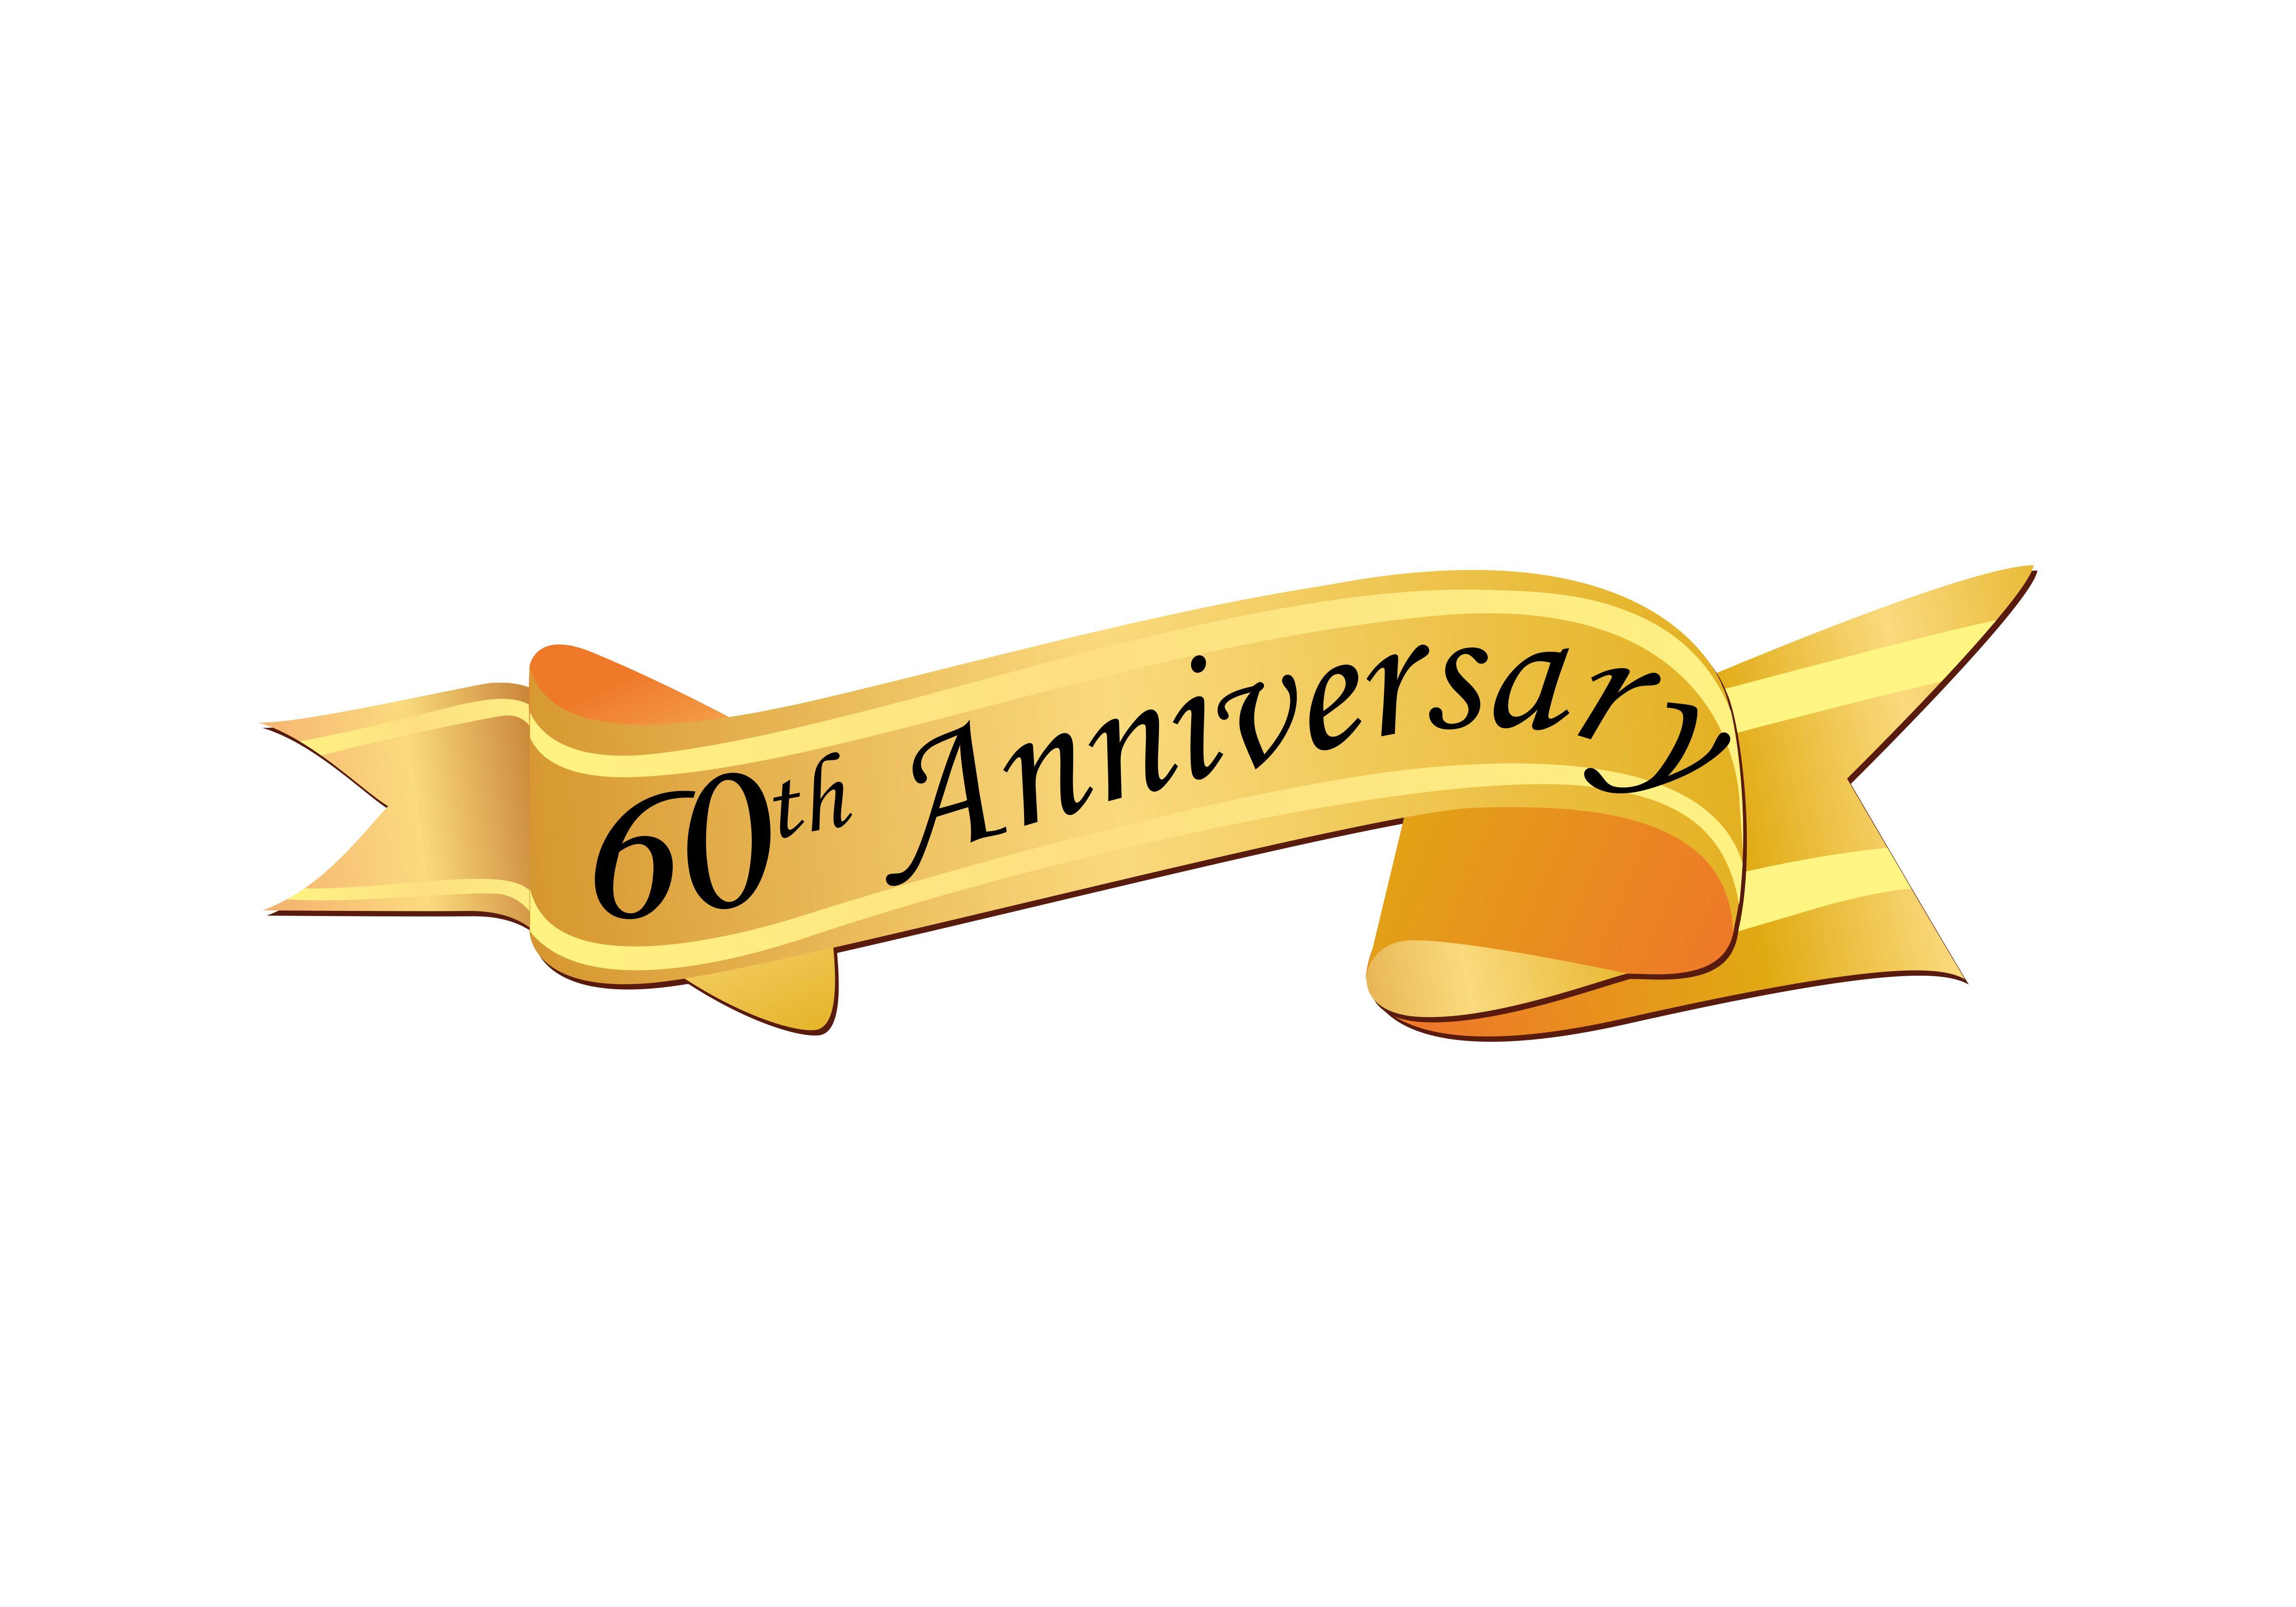 60th Anniversary luxury logo.